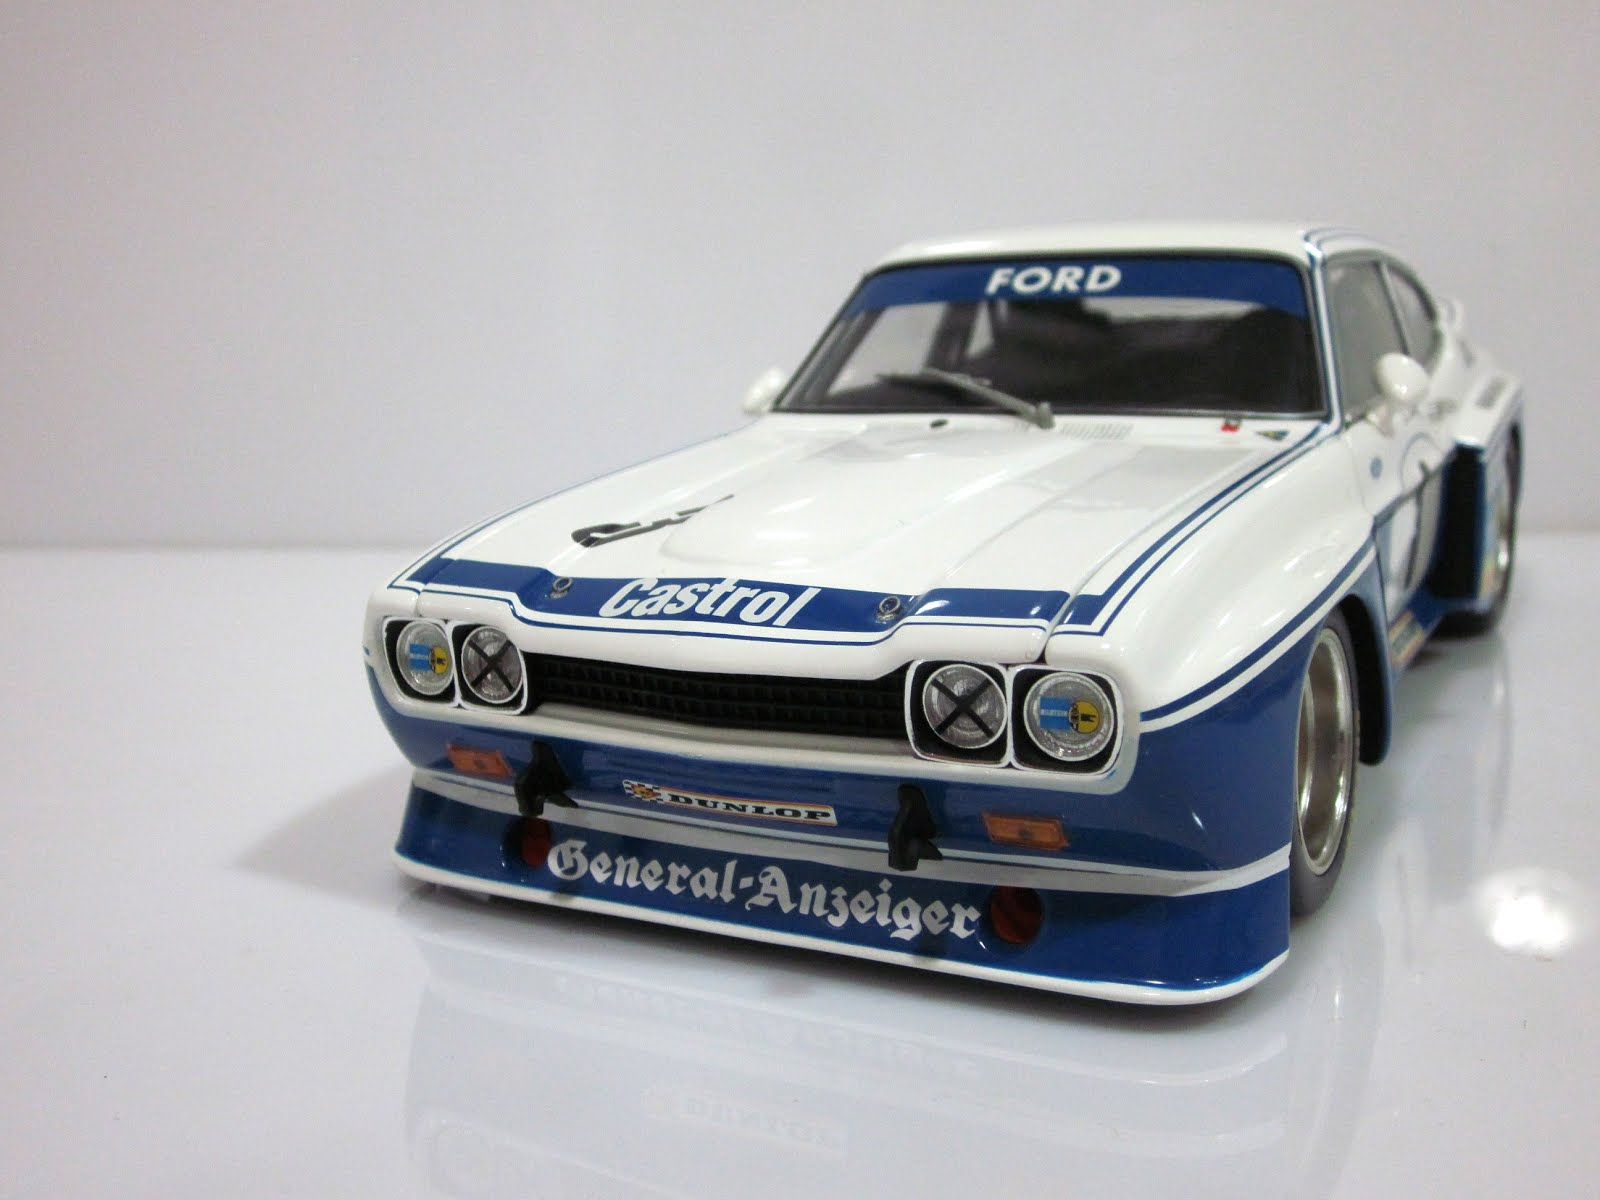 Ford Capri RS 3100 #3 K. Ludwig Hockenheimring. DRM - 1975 - Minichamps